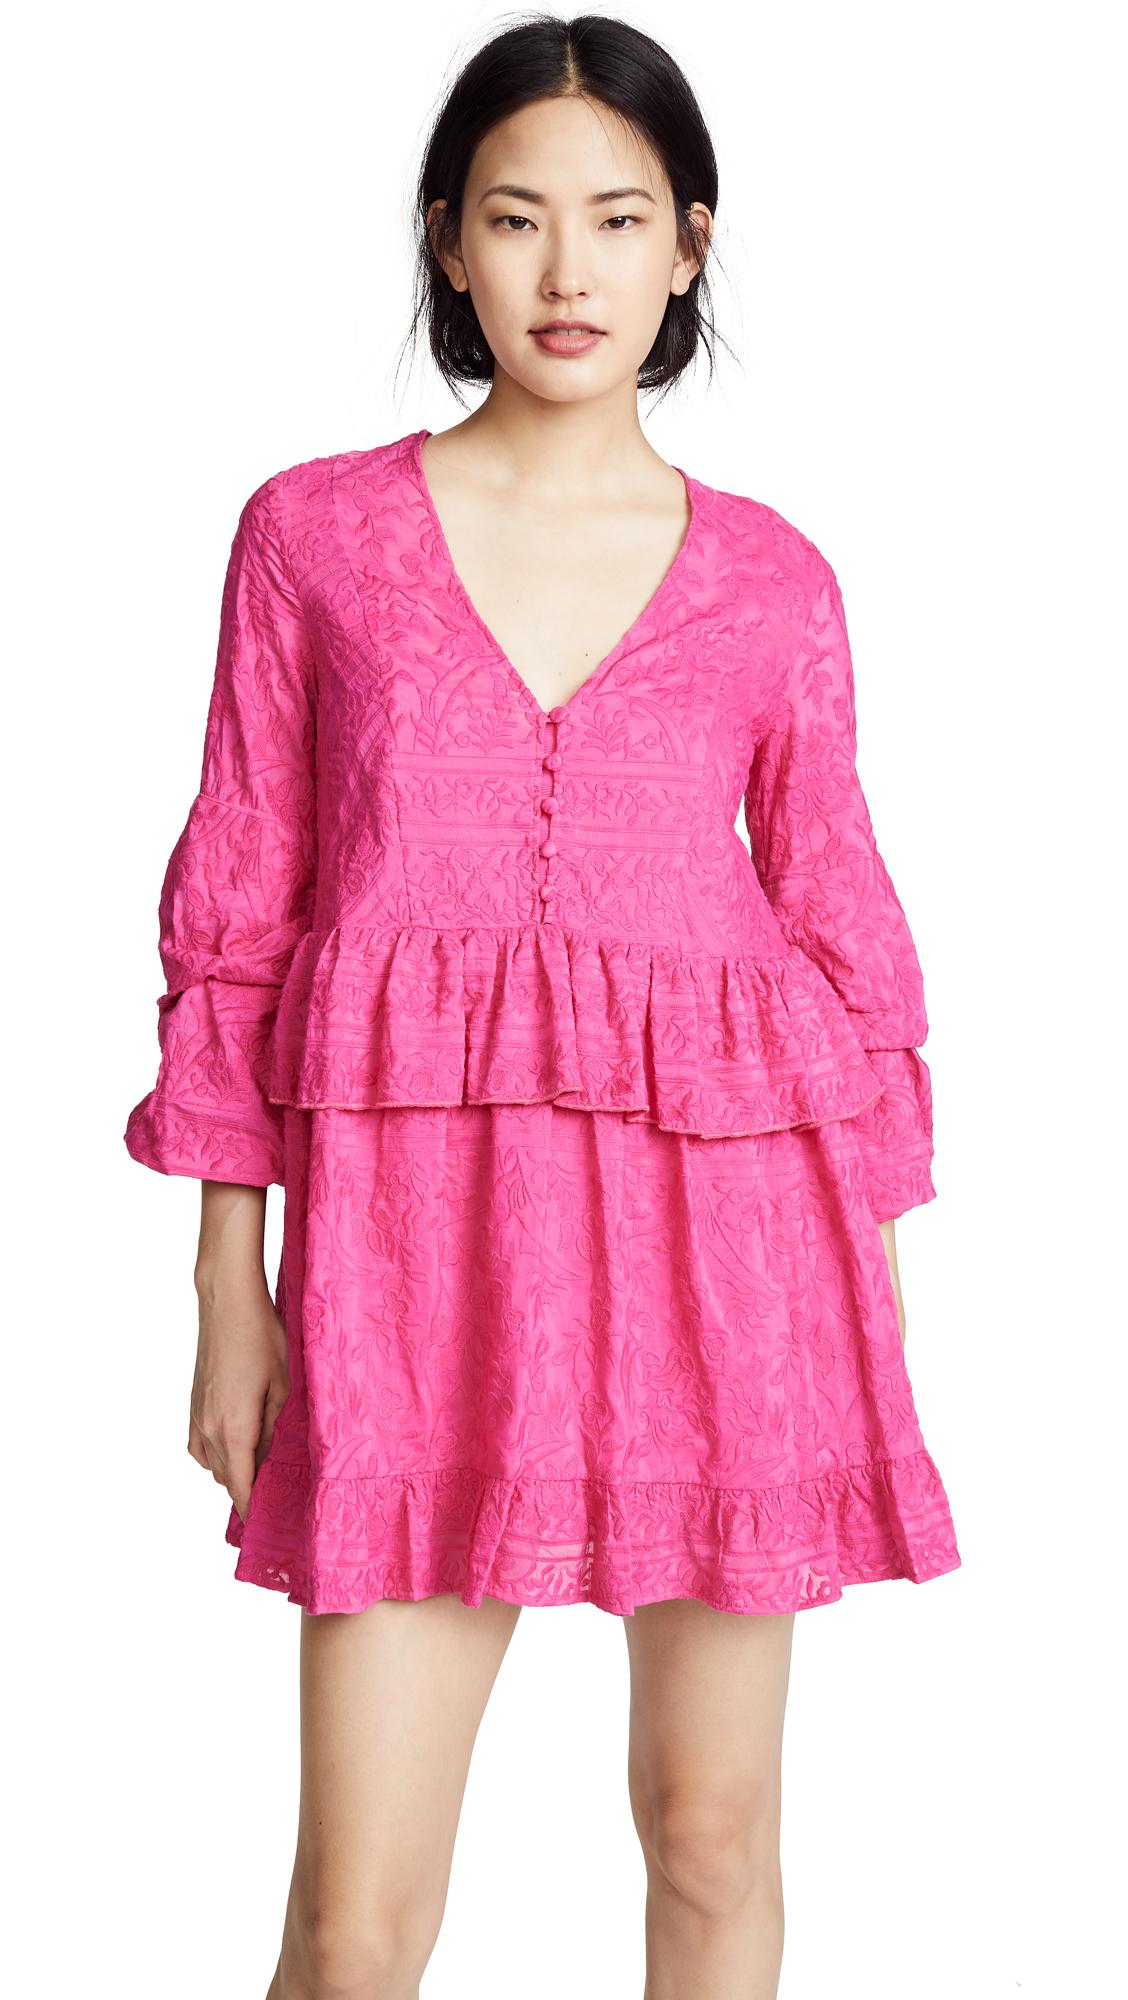 Nicholas N/Nicholas Ivy Embroidery Mini Dress In Magenta